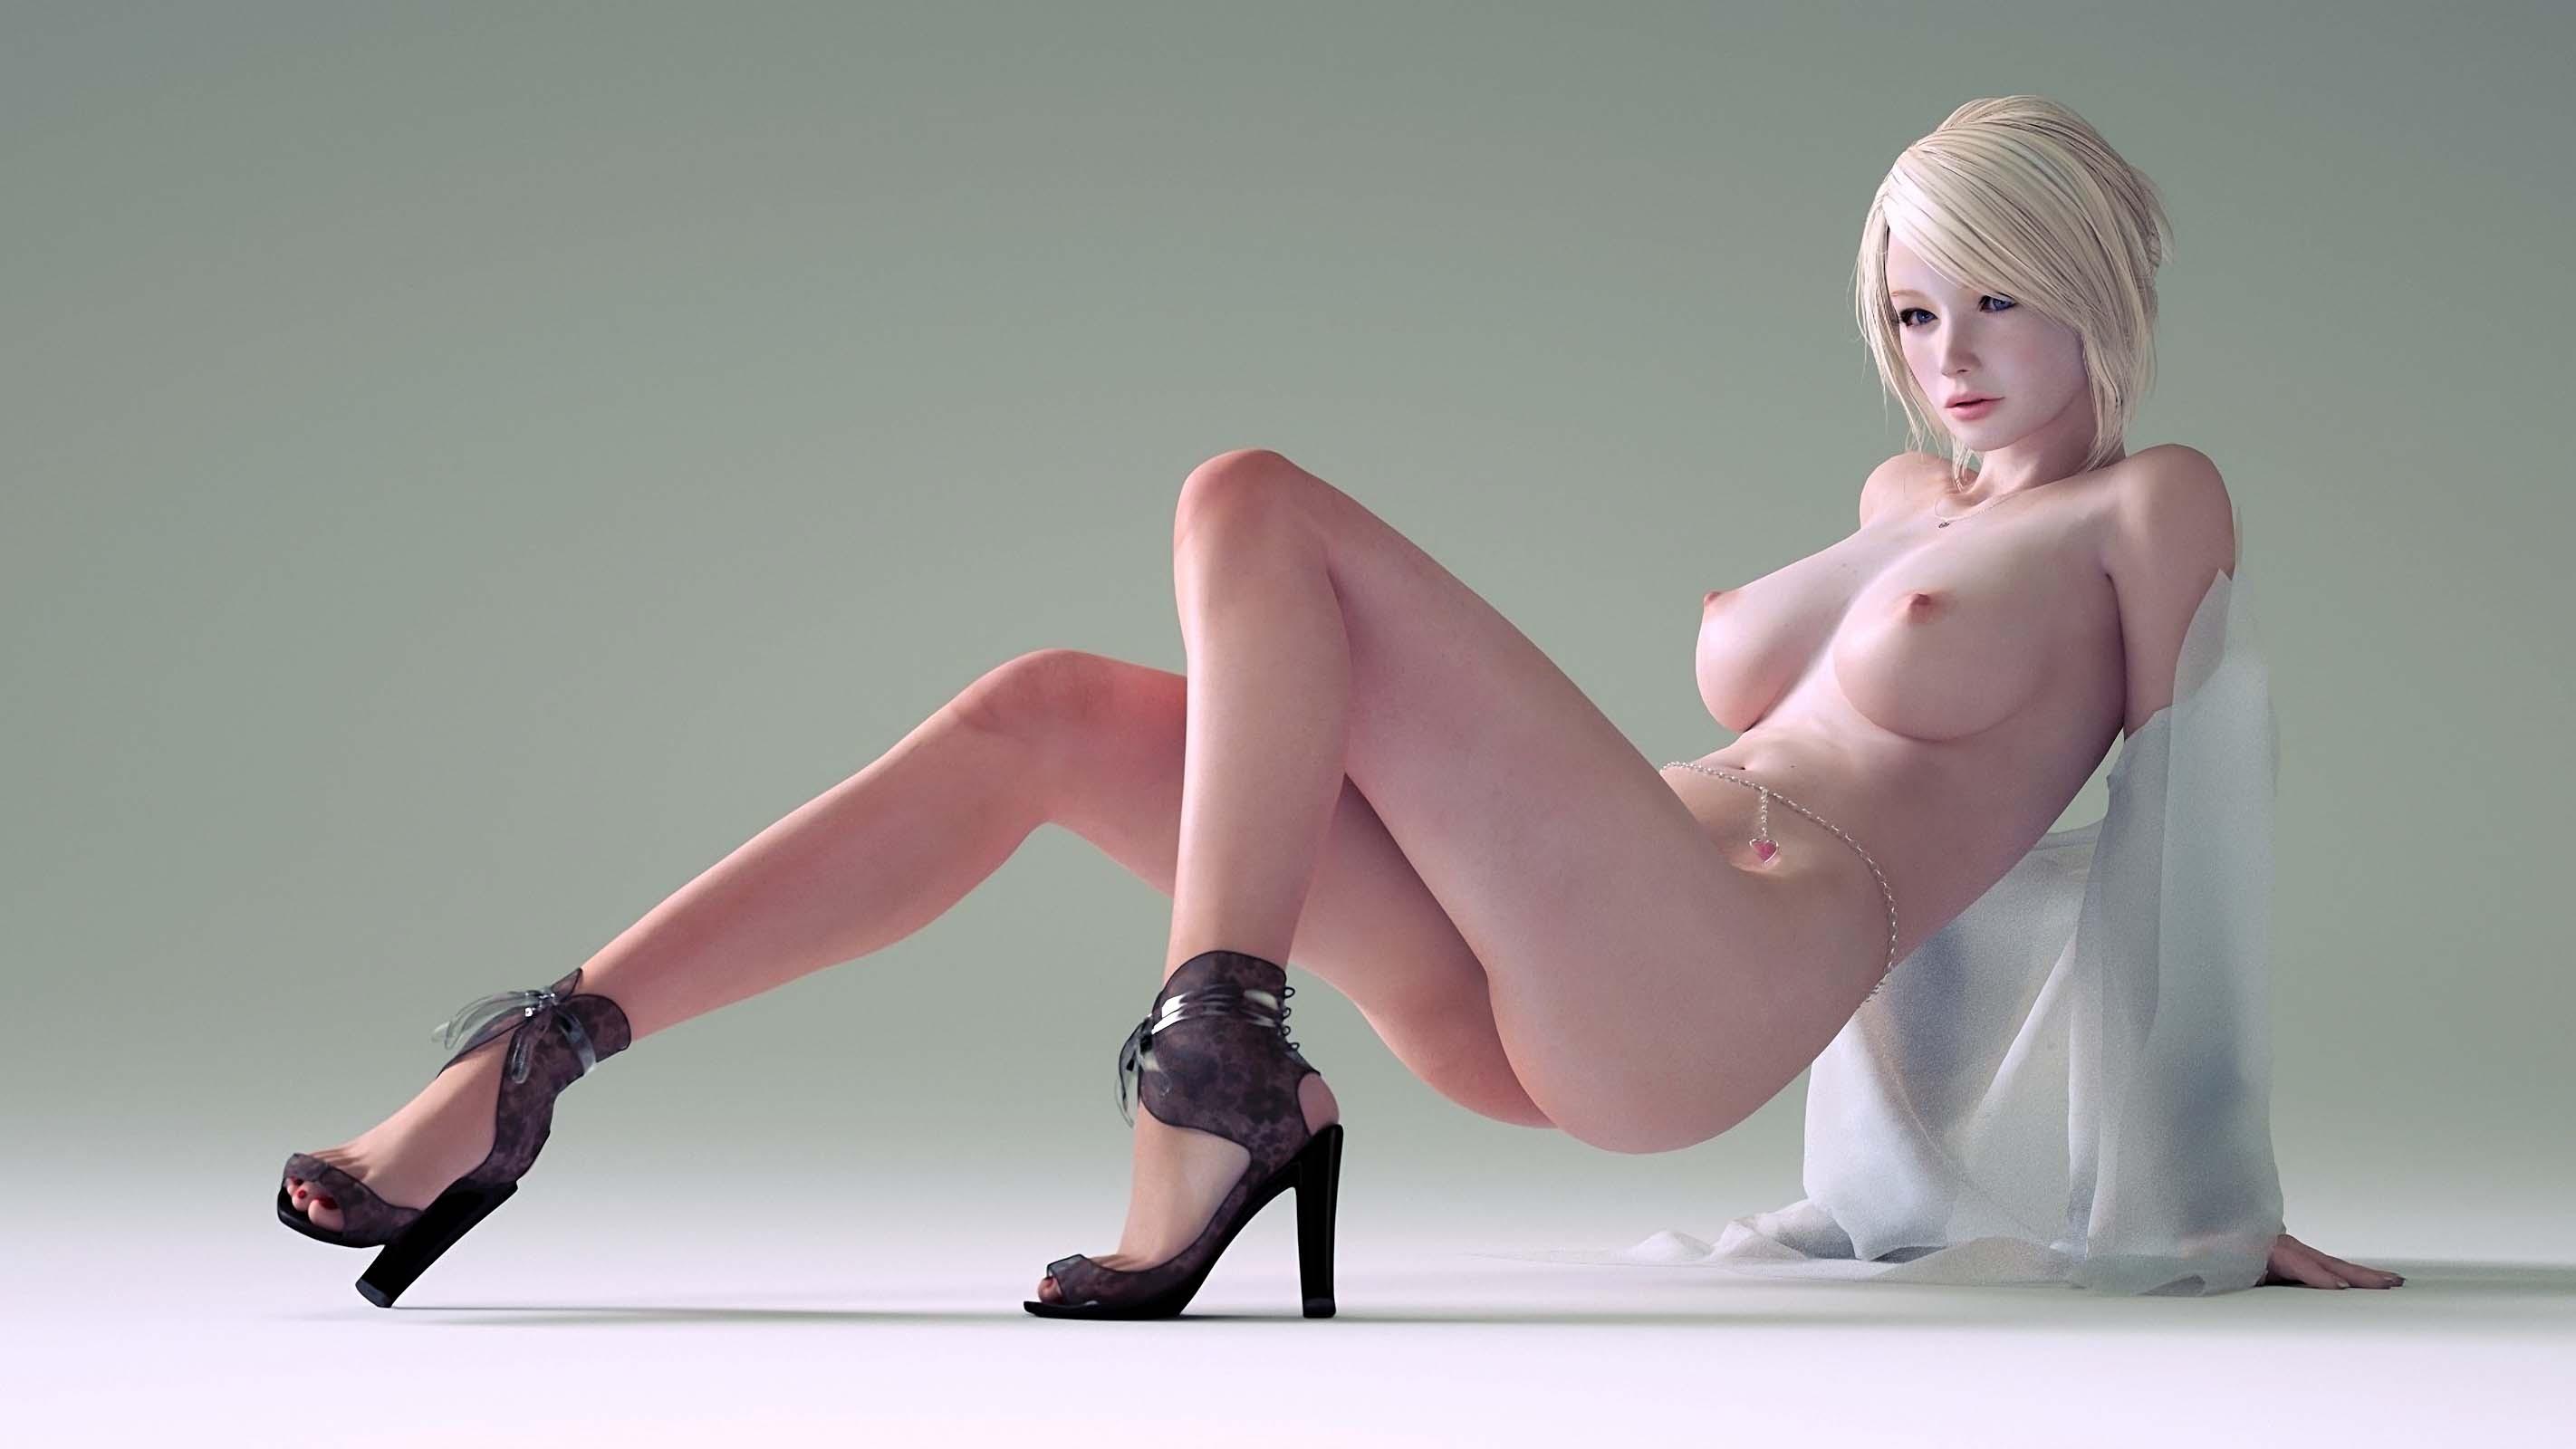 Sex animation hd